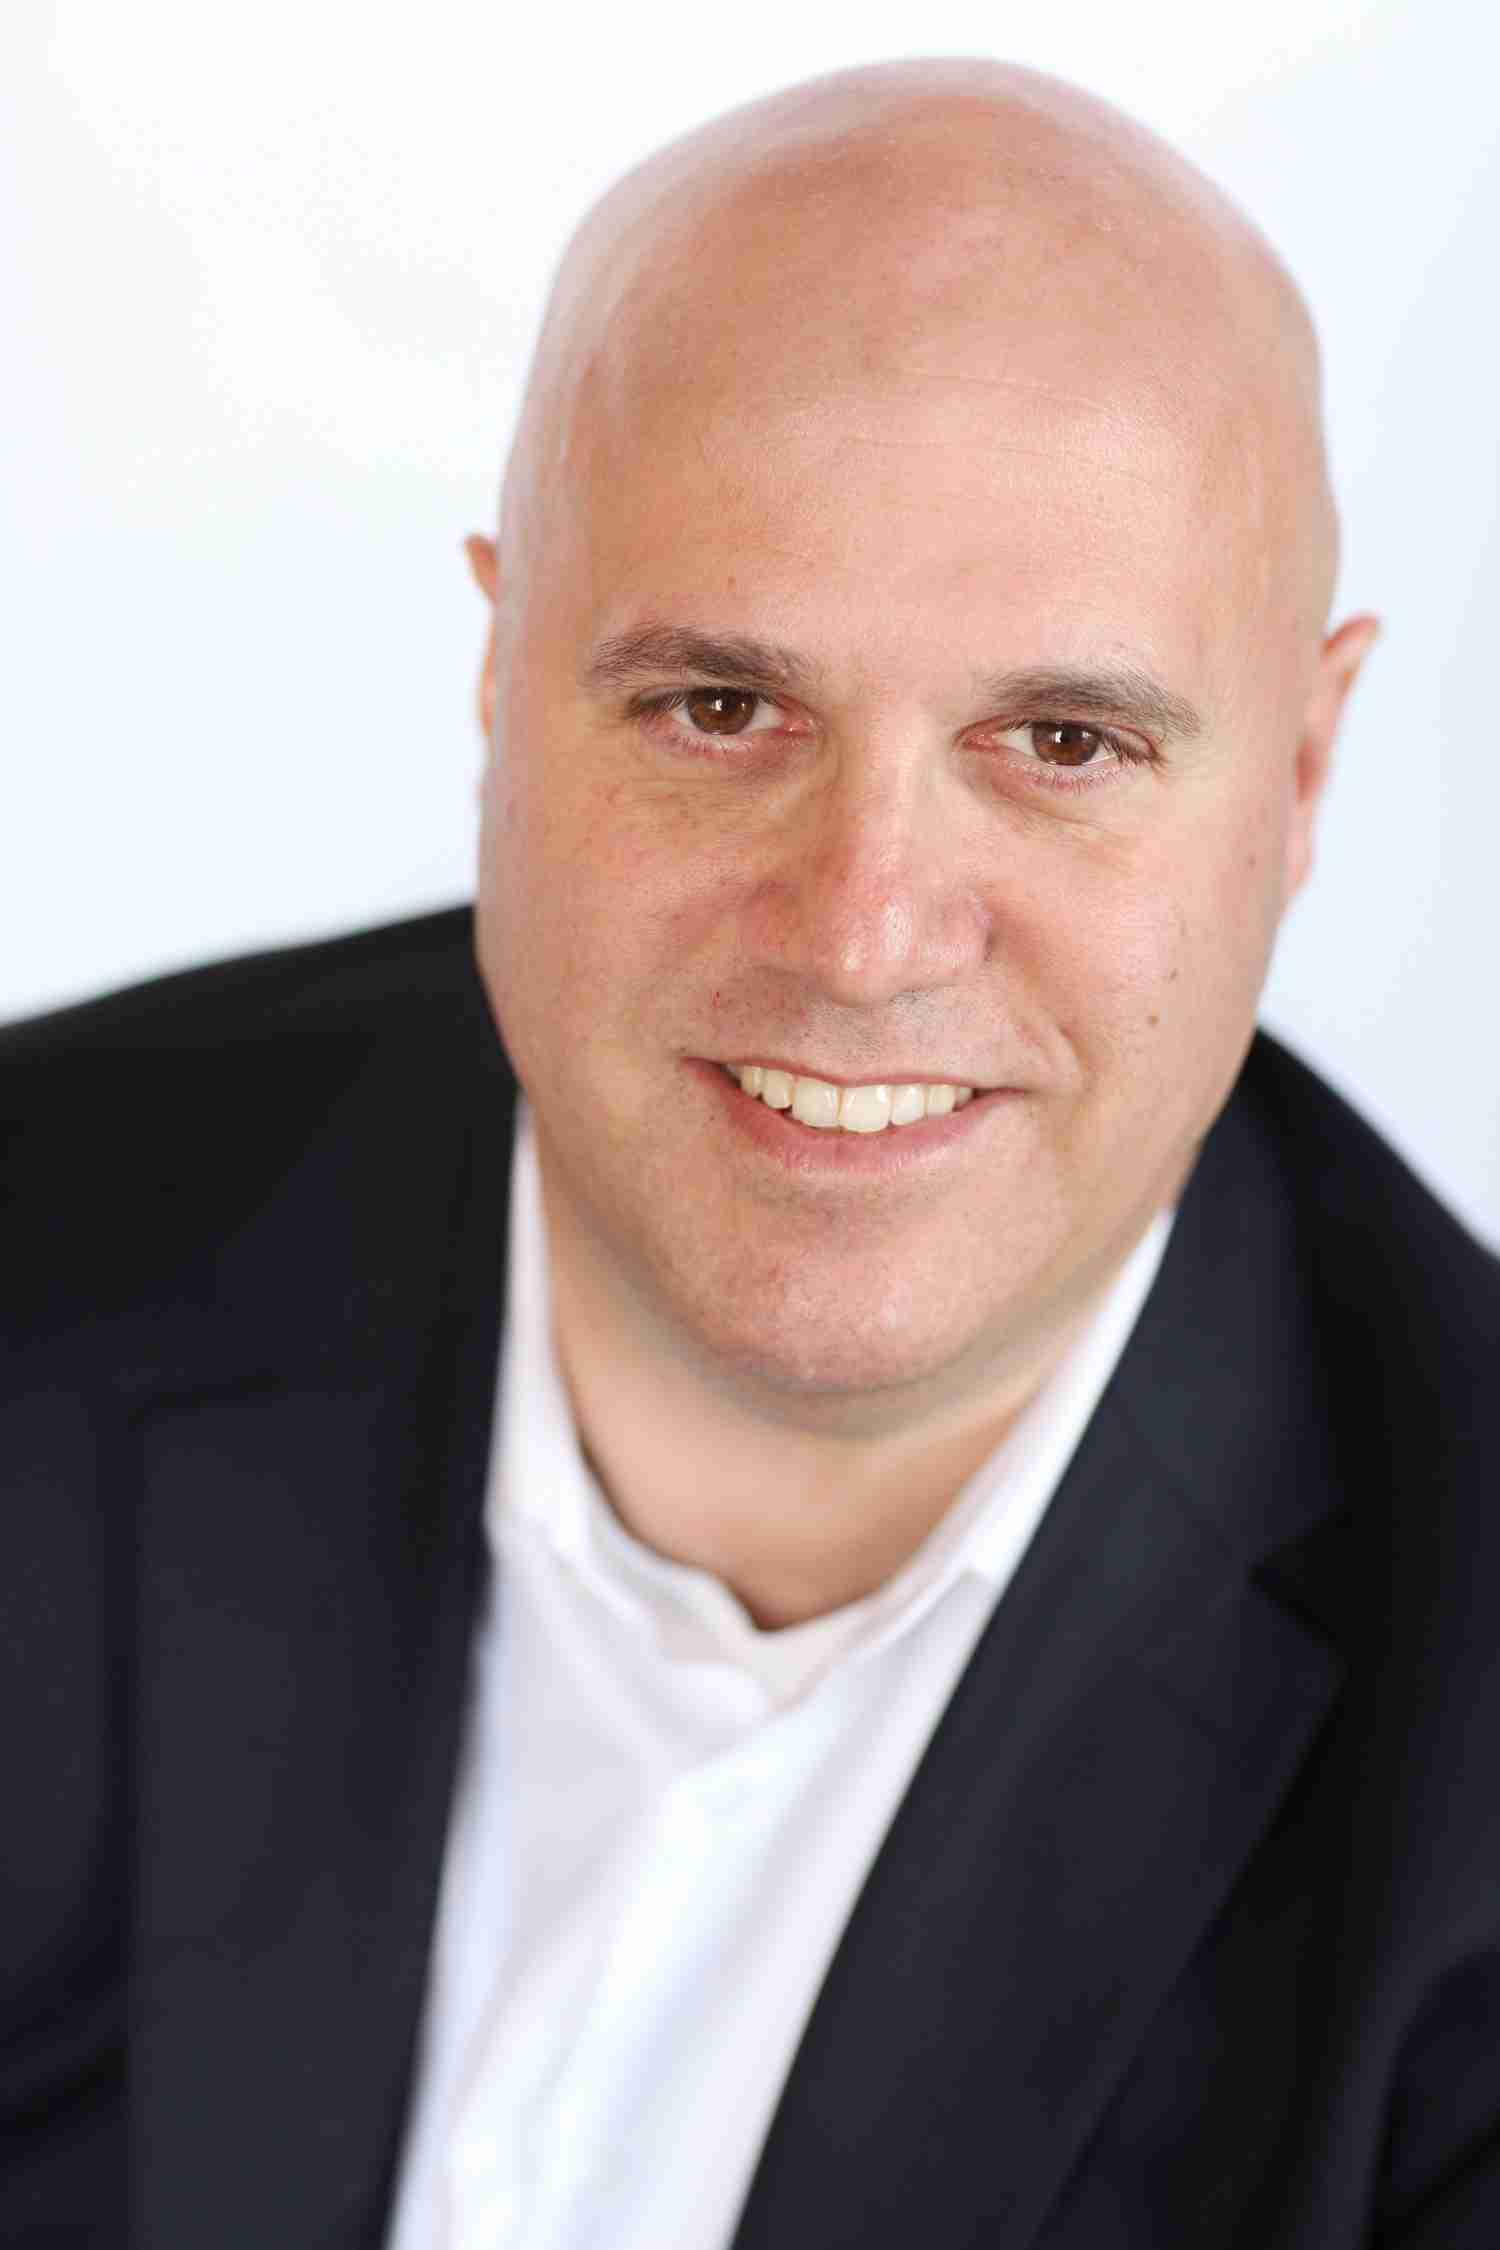 AEye Advisory Board Profile: Tim Shiple